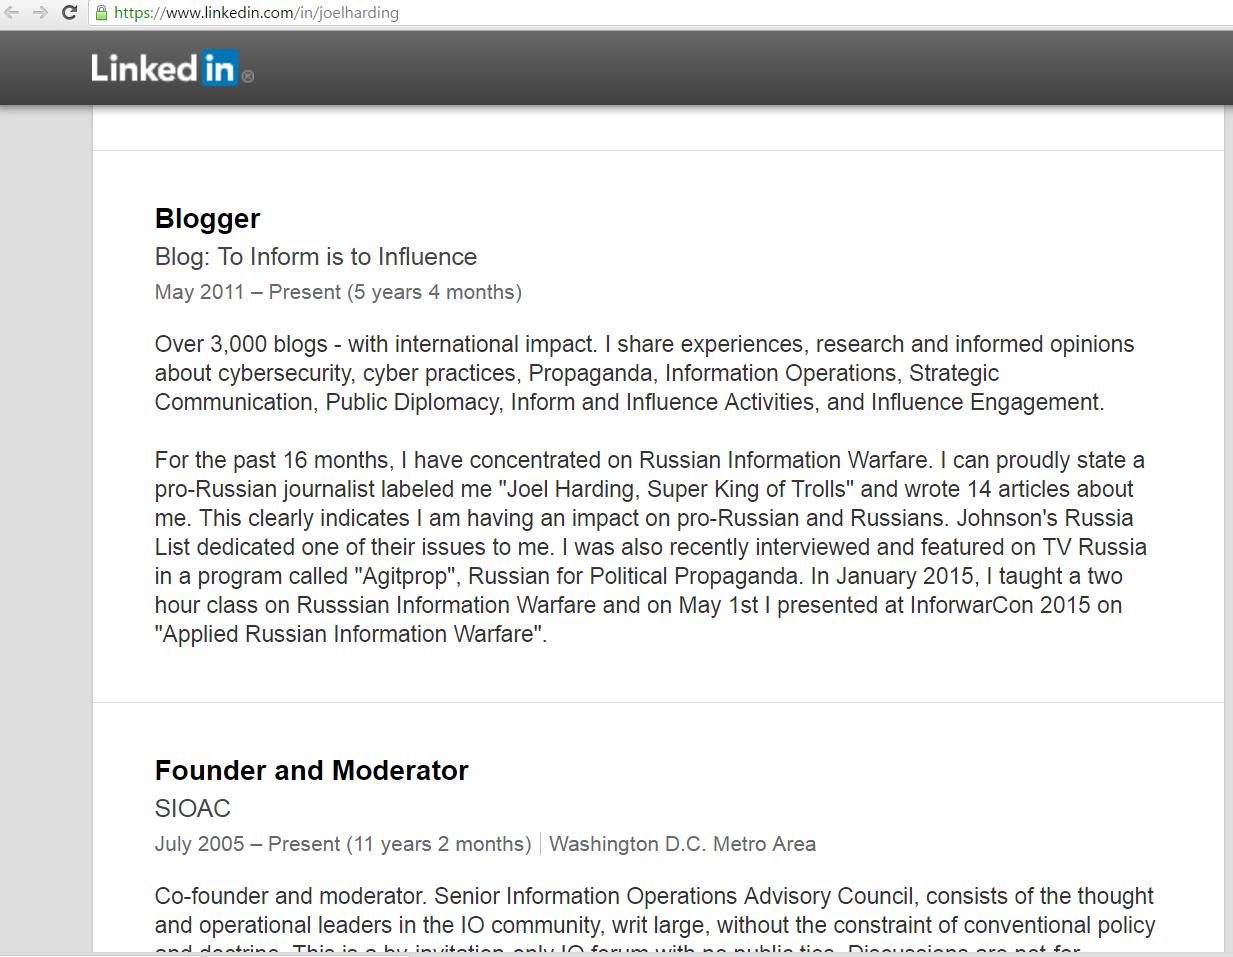 C:\Users\футжишечка\Desktop\LINKEDIN\Harding\Harding LinkedIn profile (2).PNG